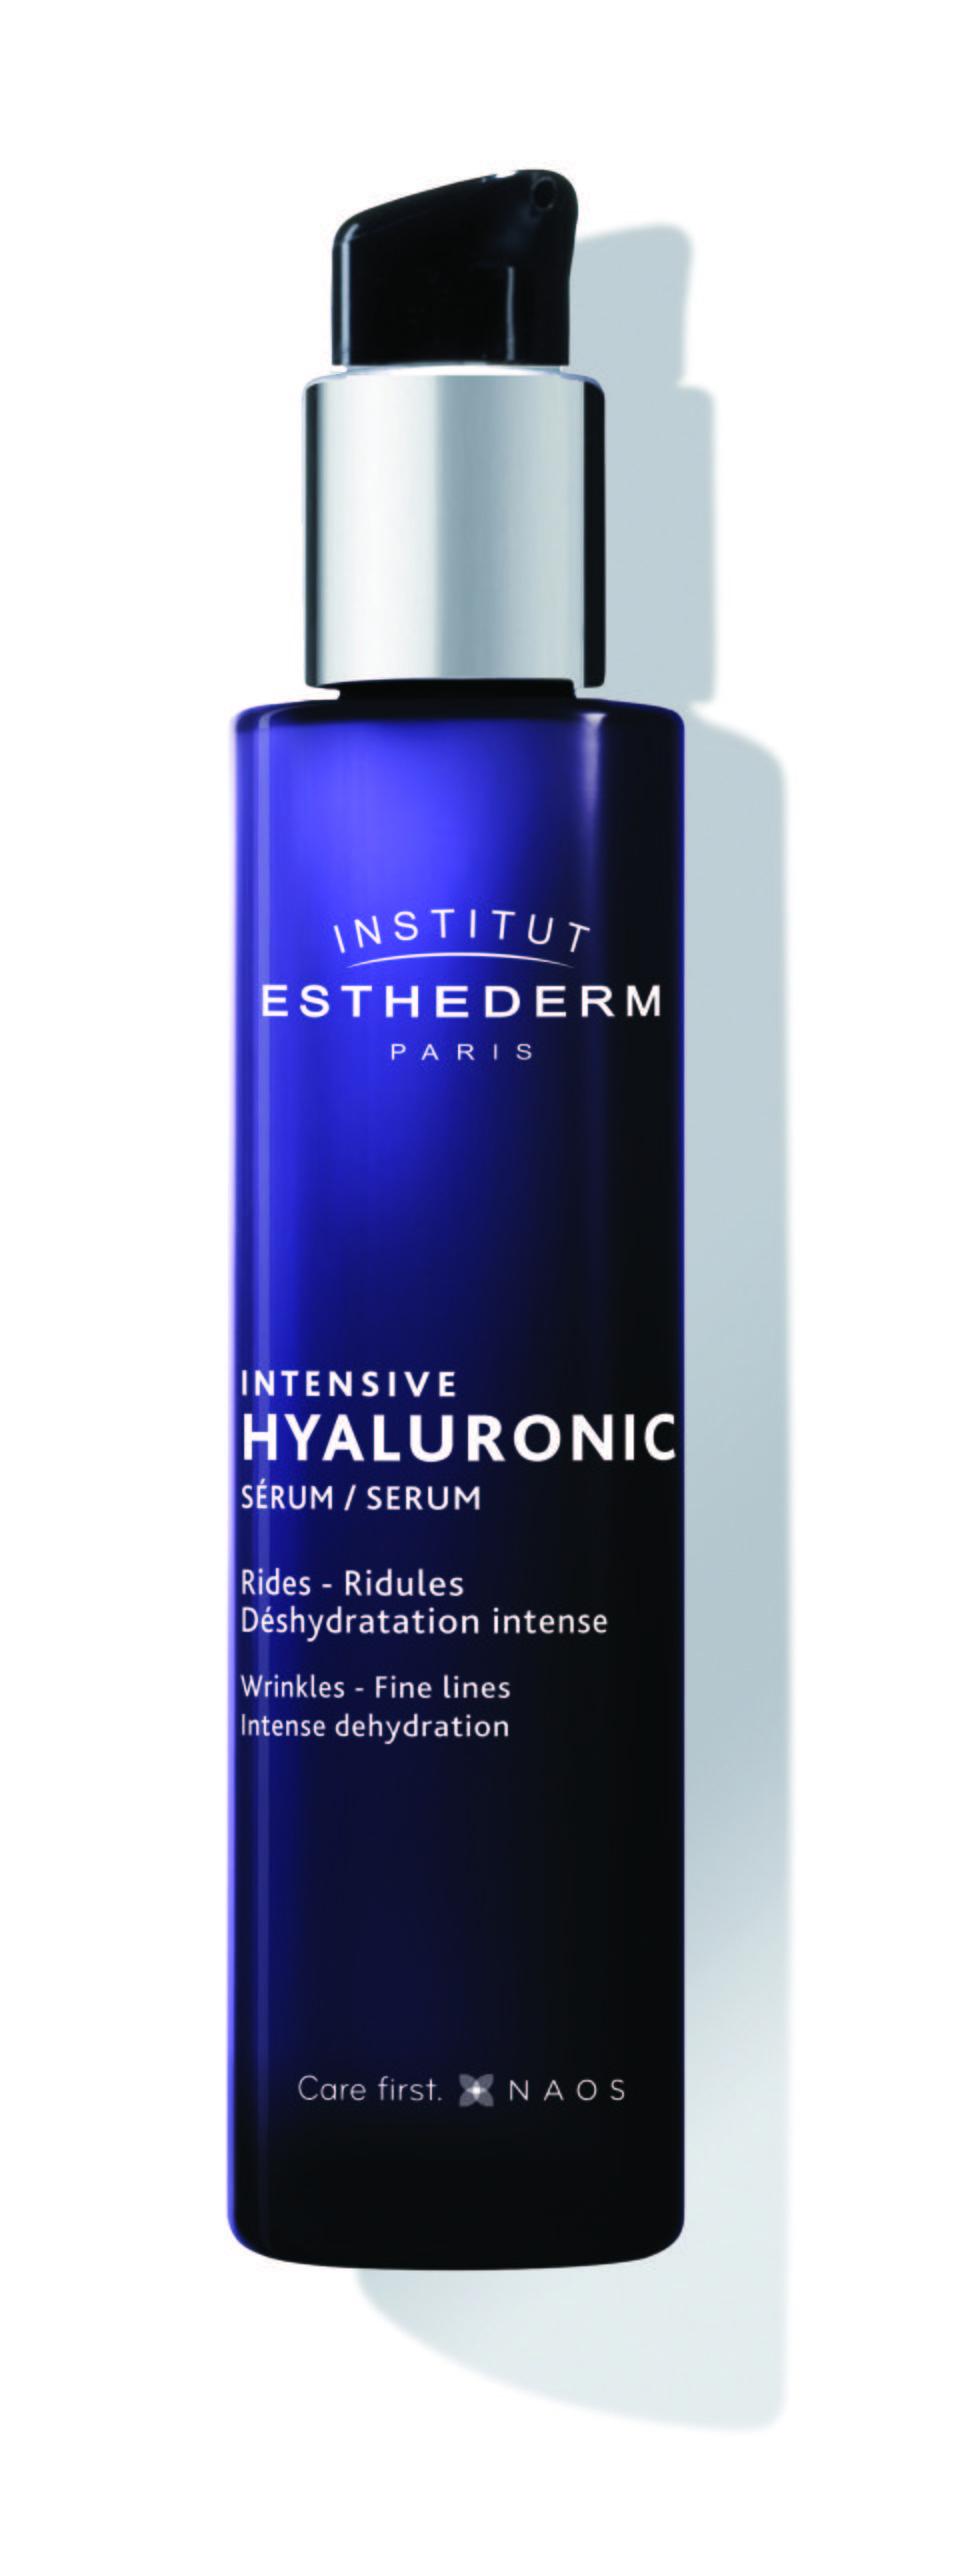 INSTITUT ESTHEDERM - INTENSIVE HYALURONIC SERUM